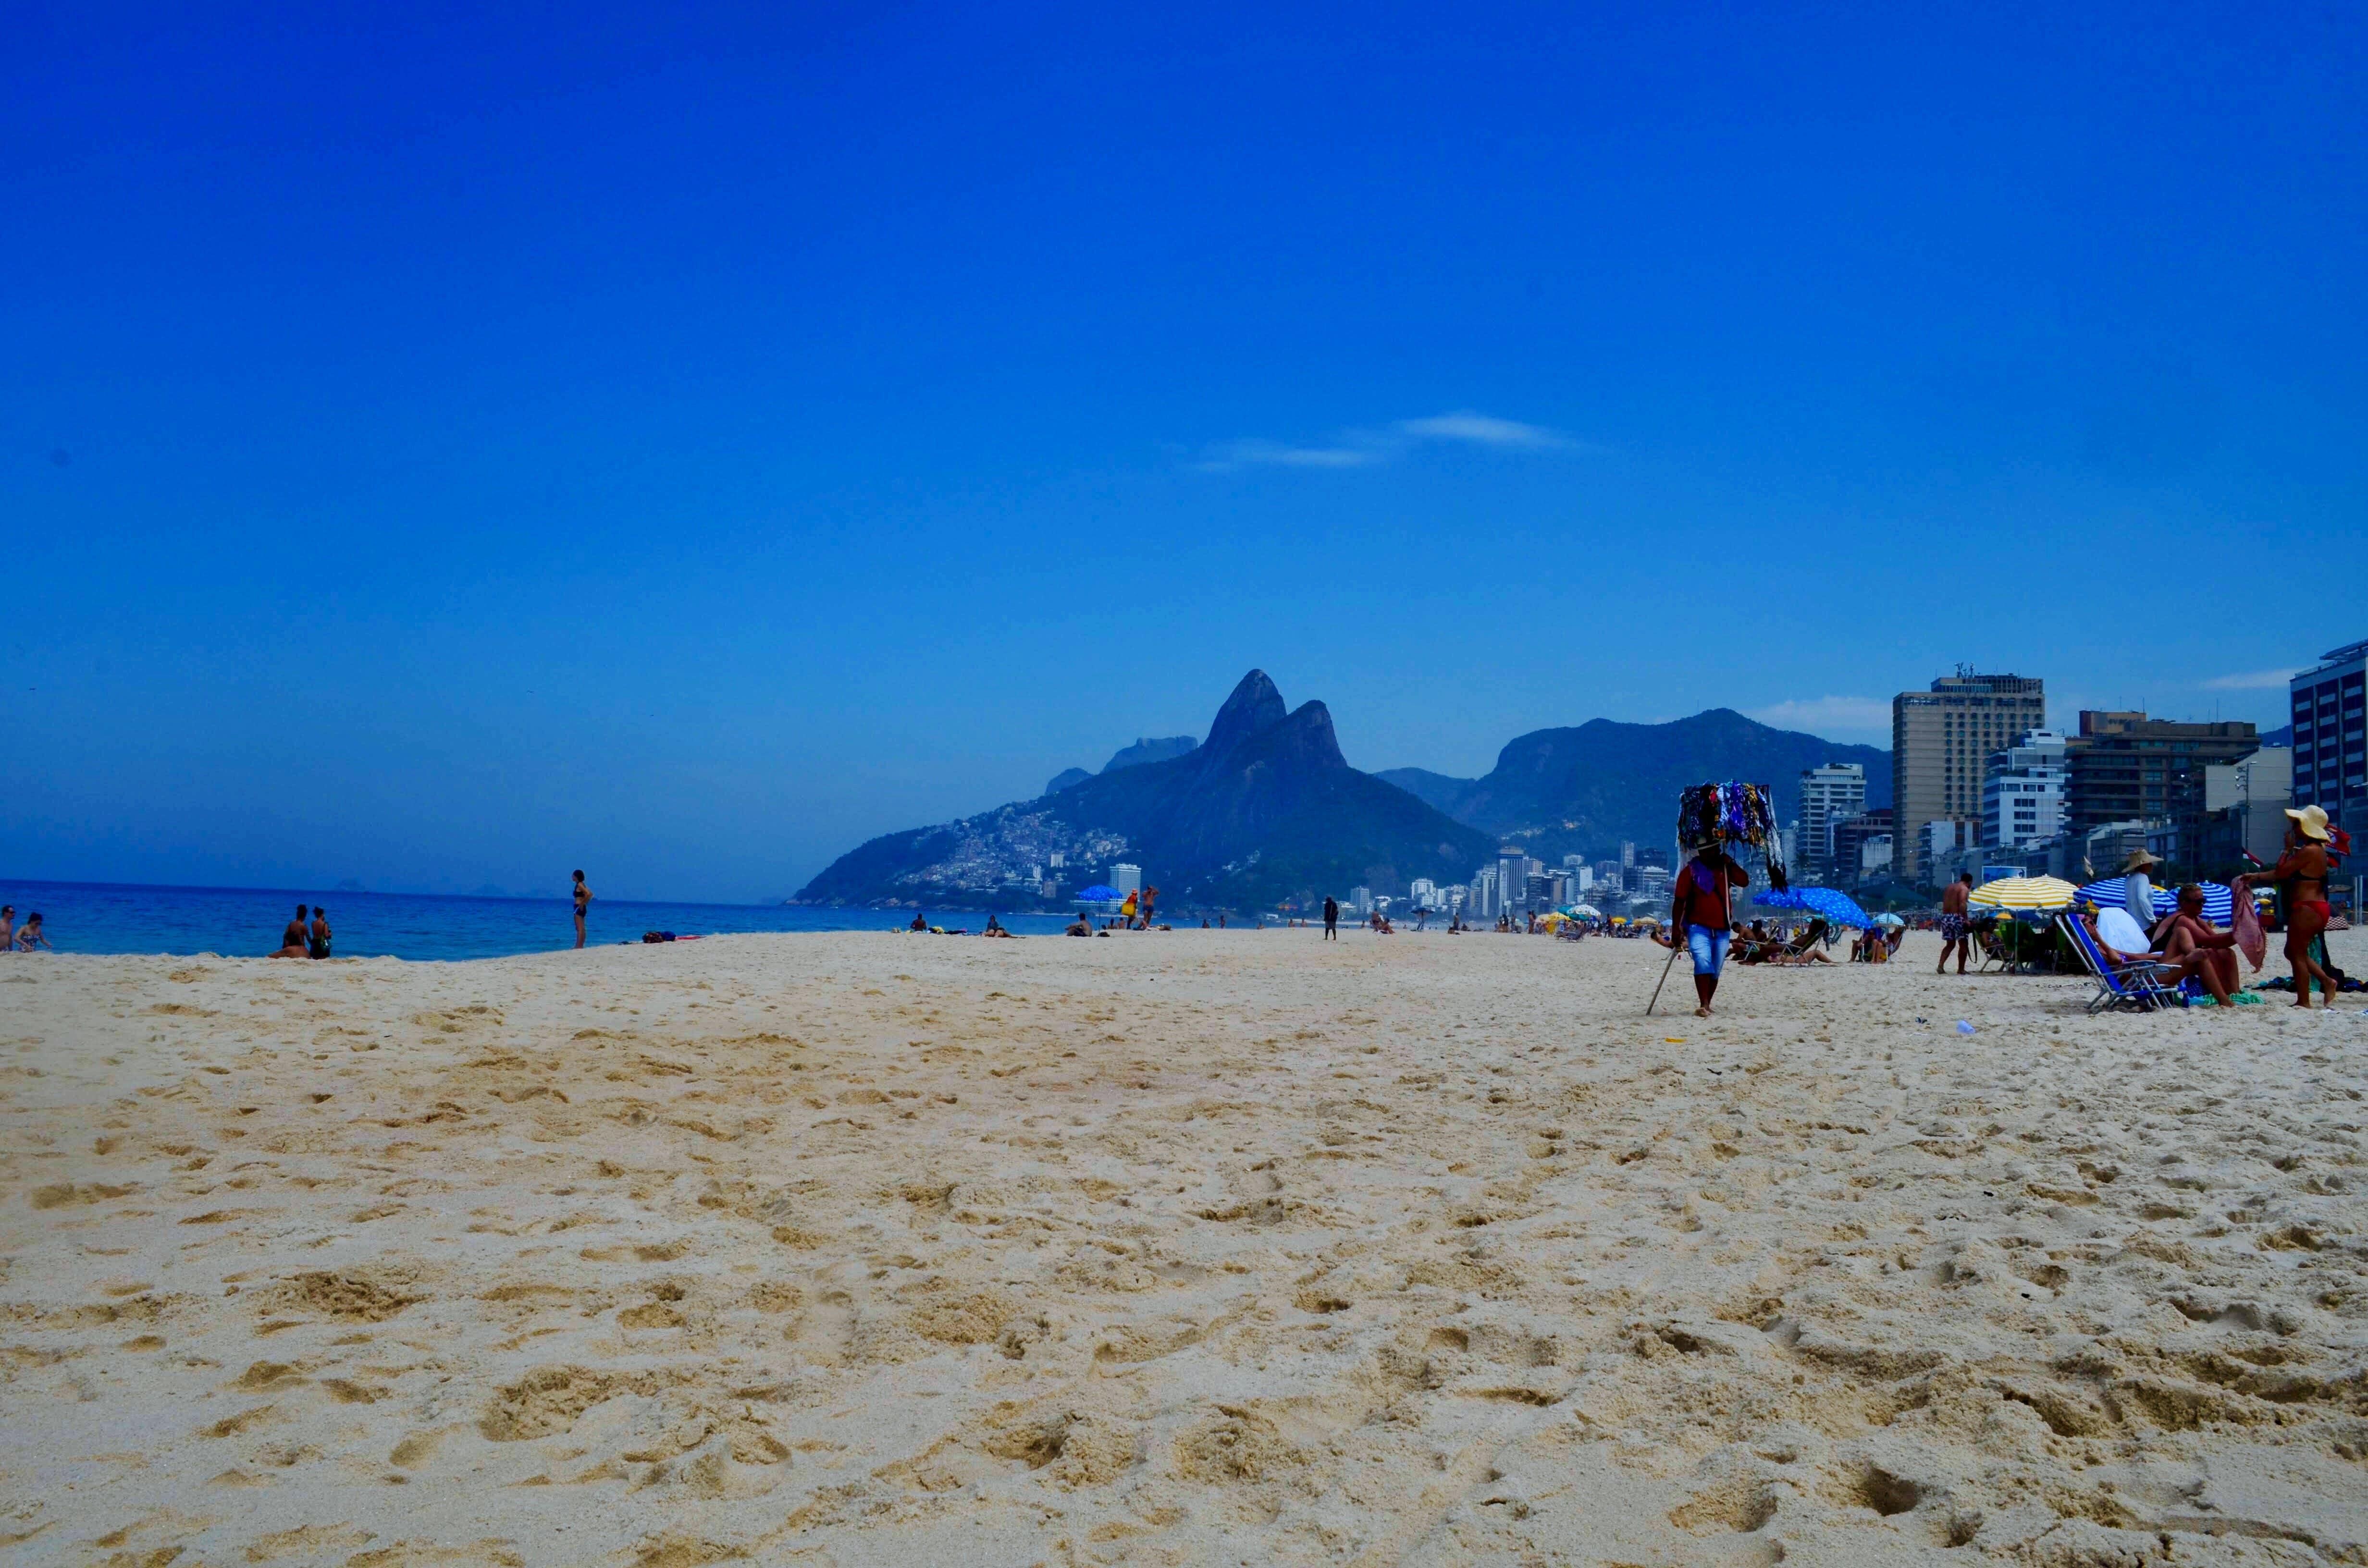 Free stock photo of beach, beach front, beach safety, beaches